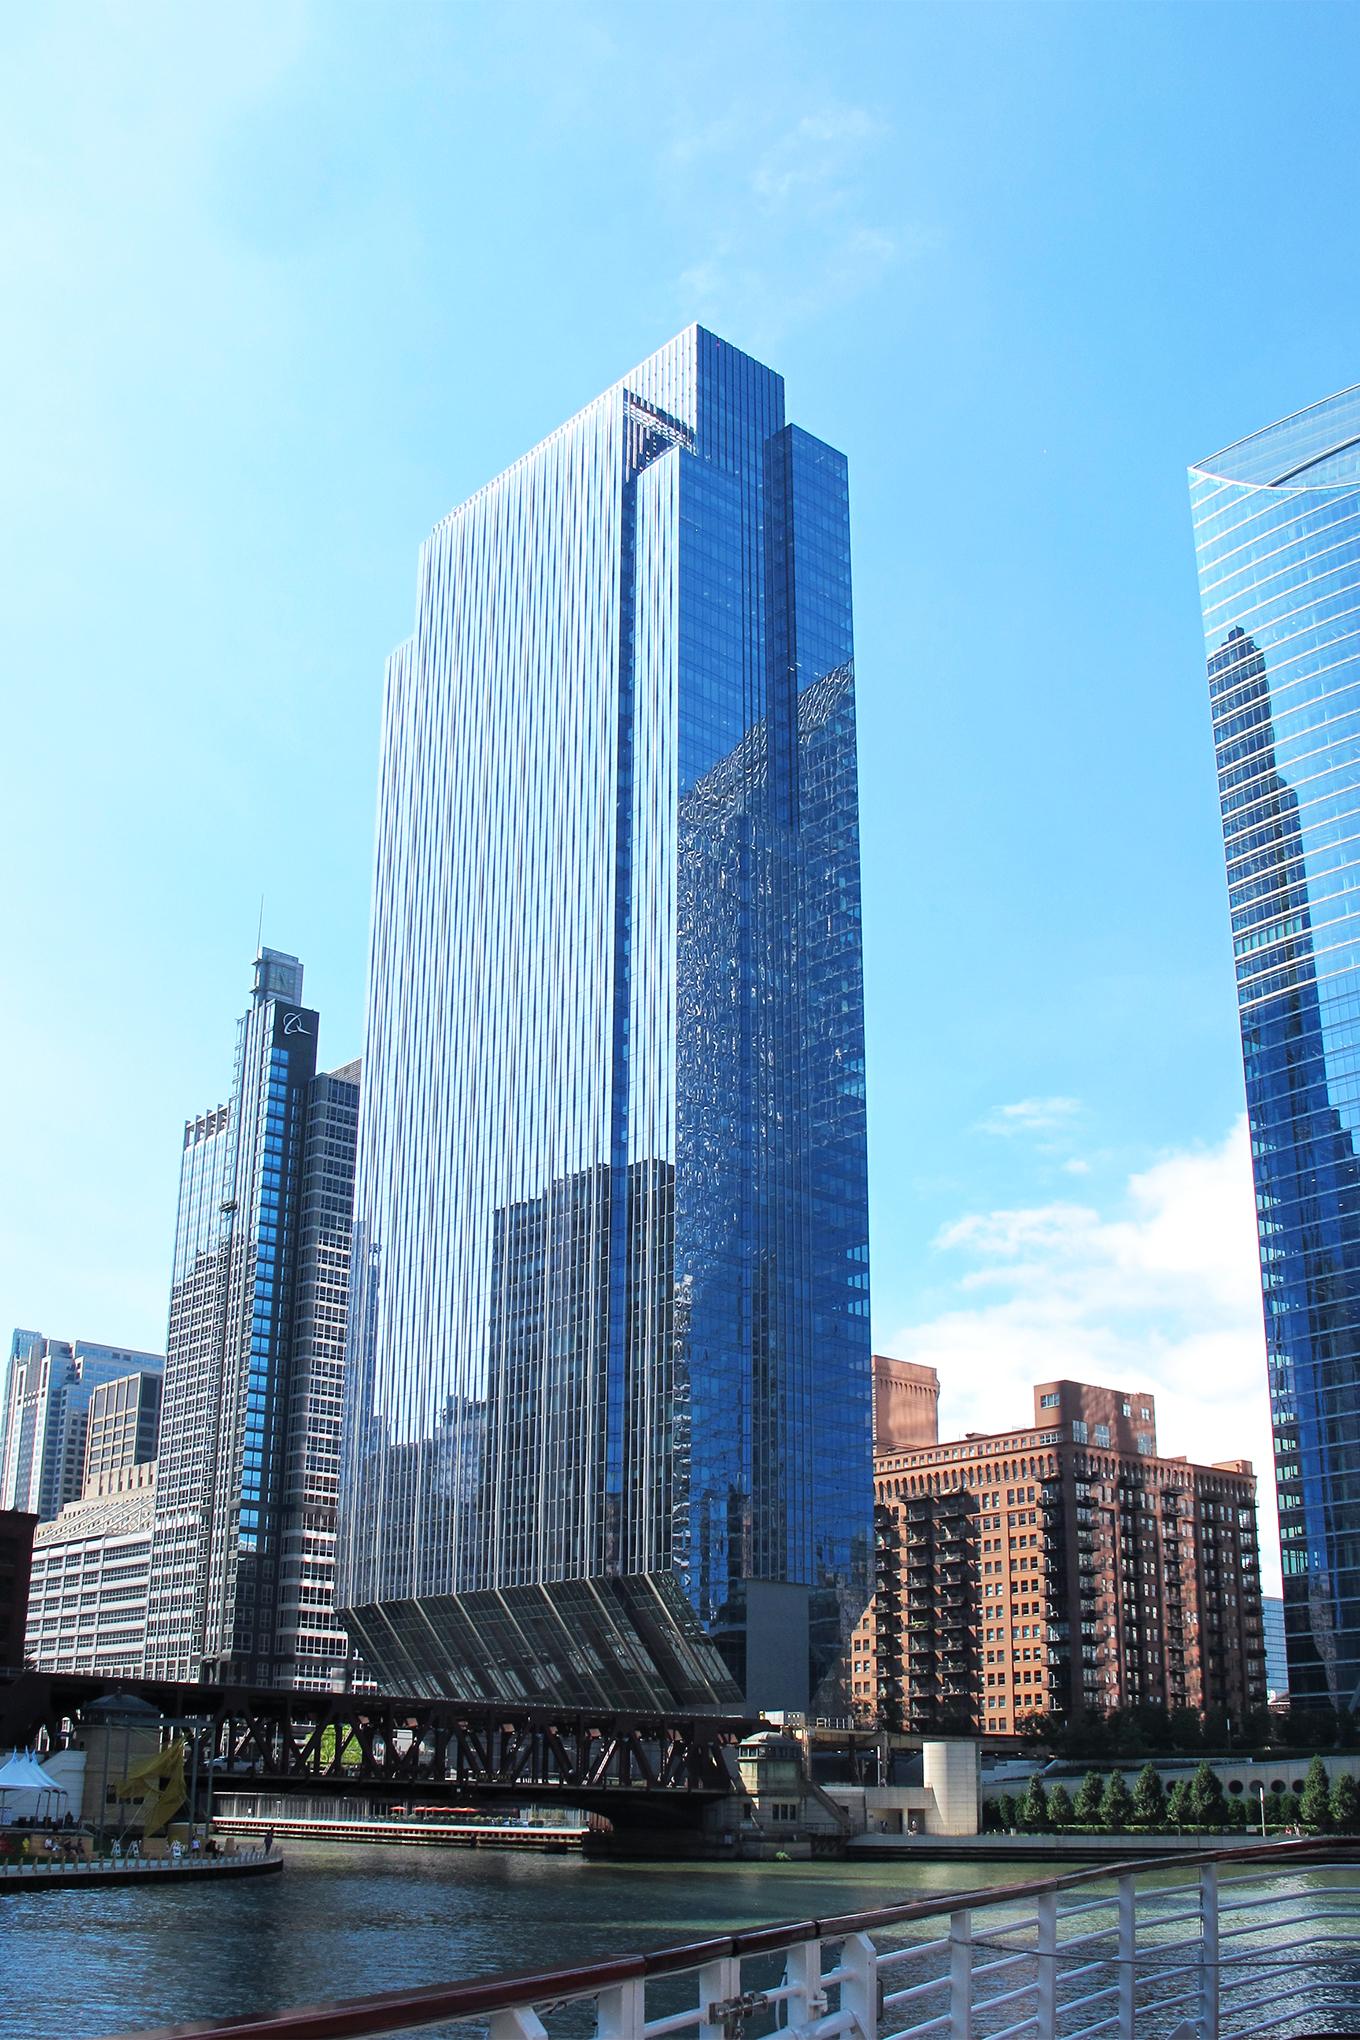 150 North Riverside, 2017, Architect: Goettsch Partners